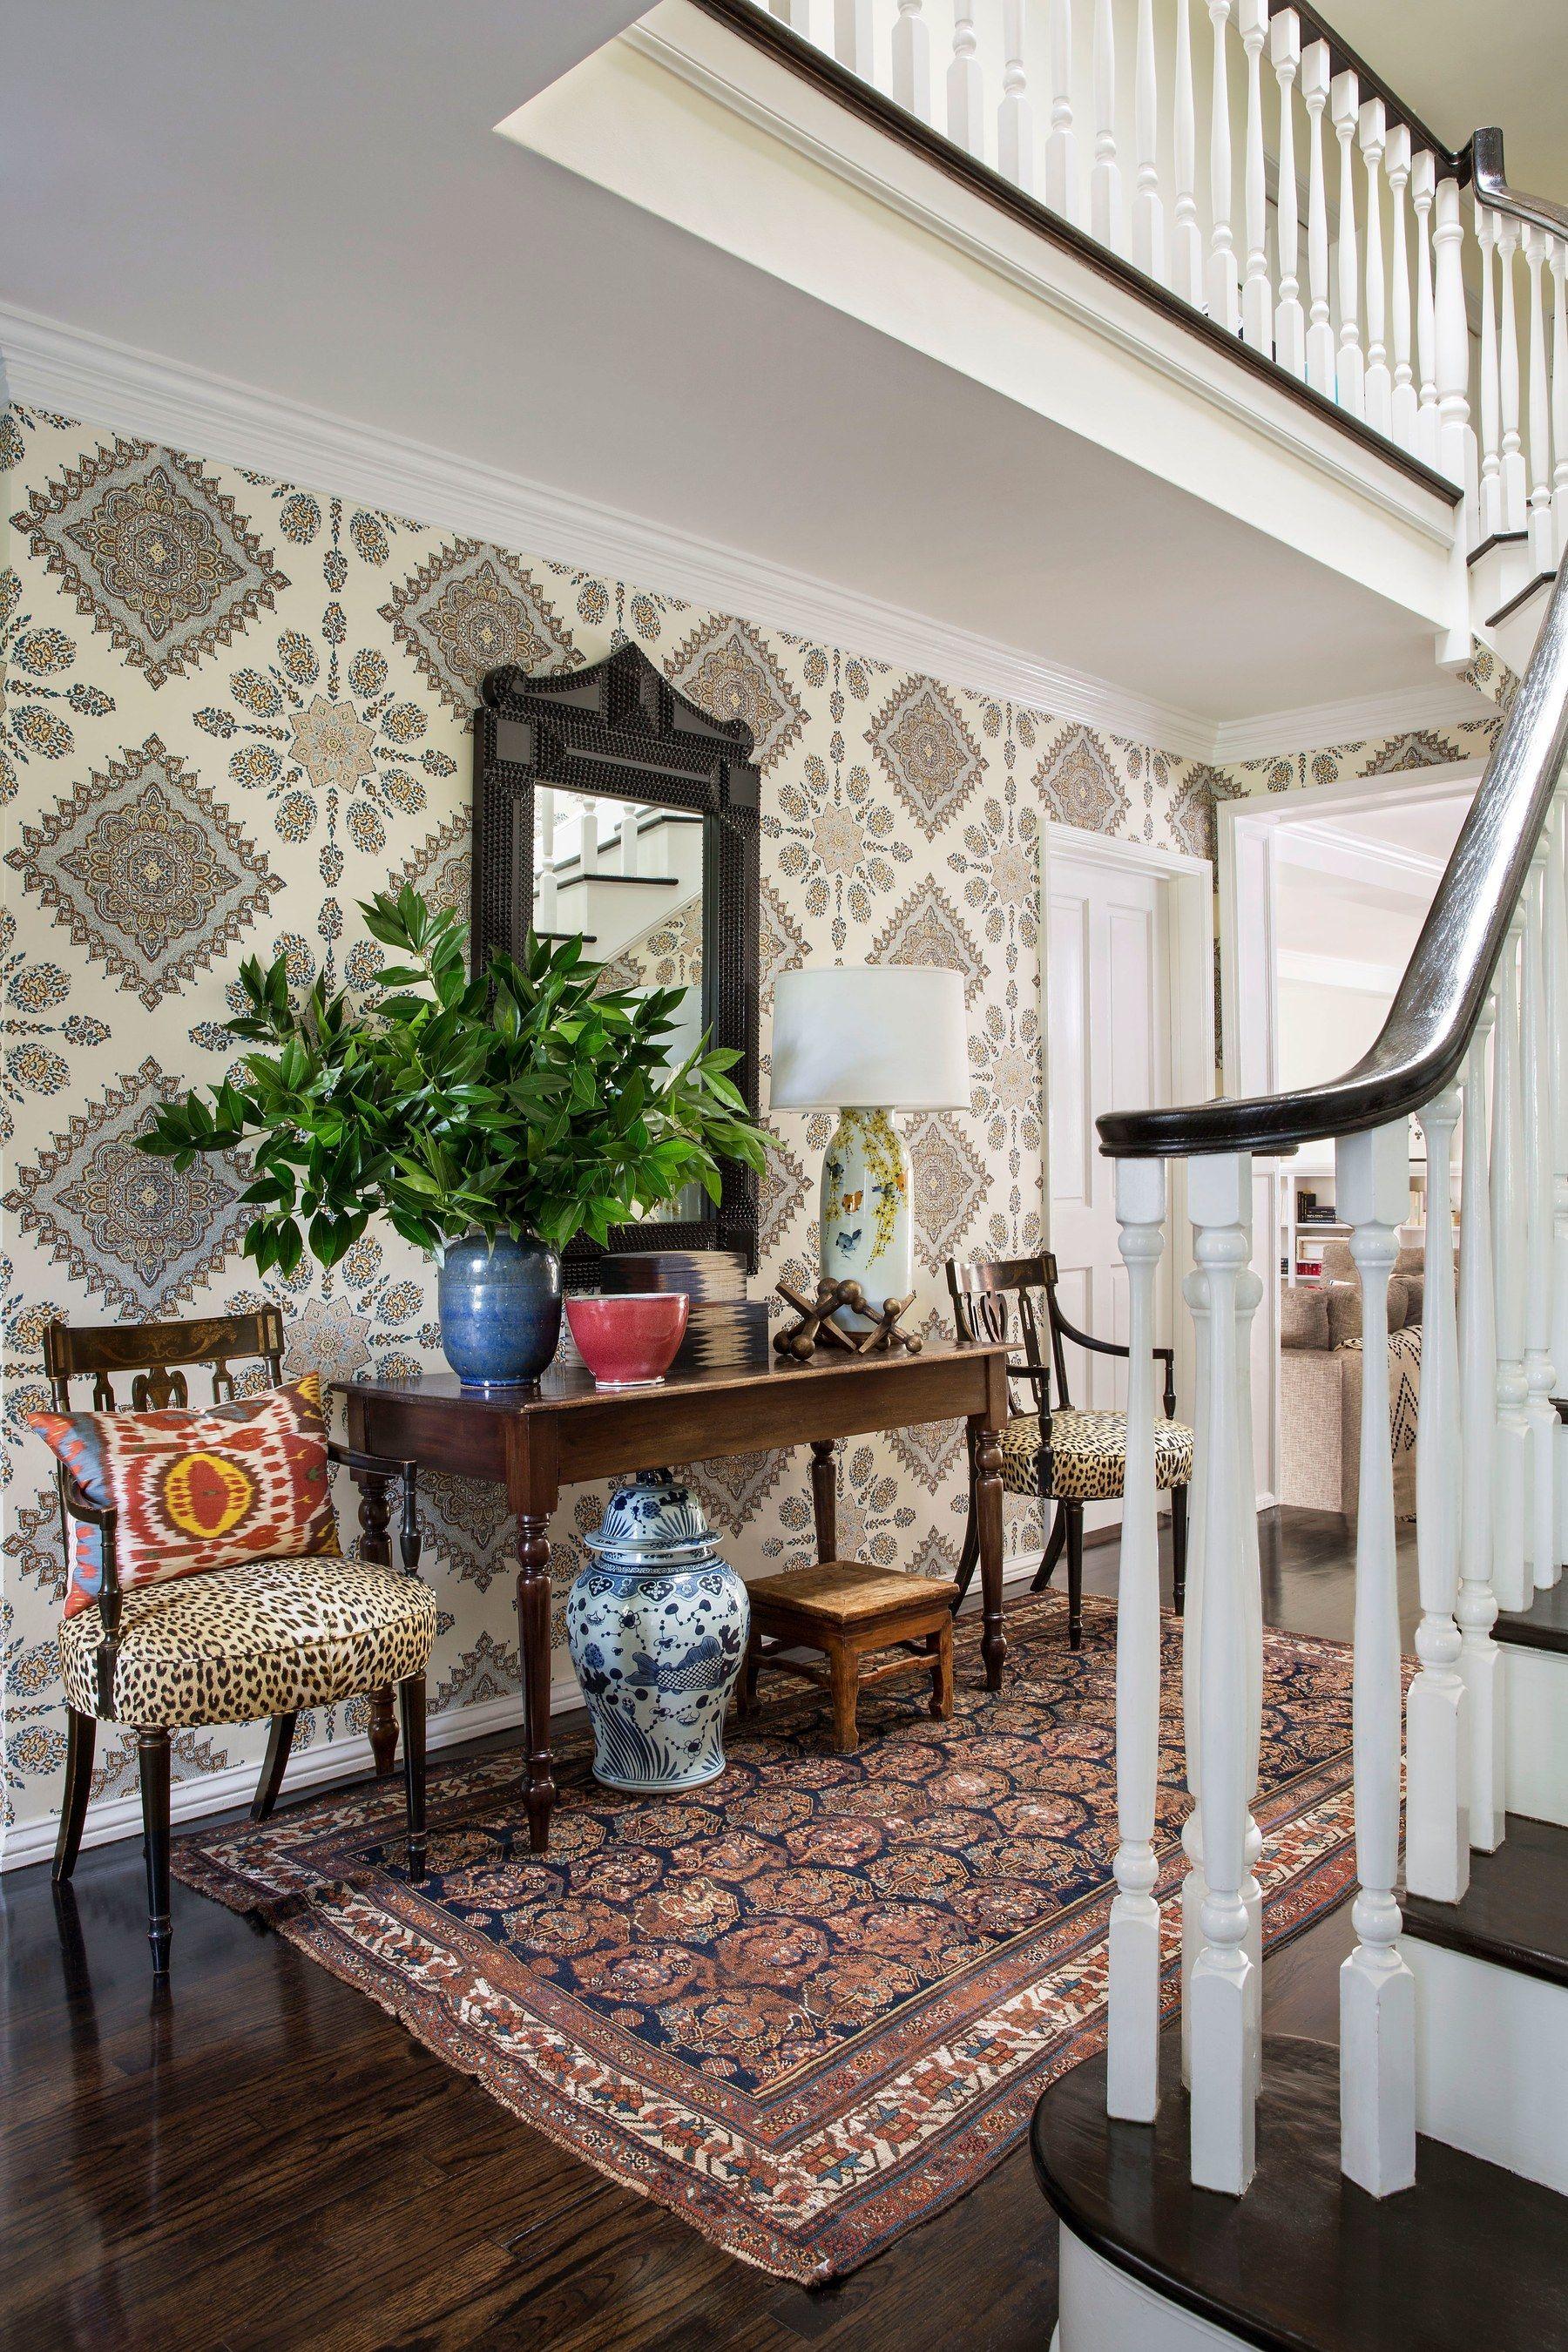 Corner Decoration Ideas How To Reimagine Overlooked Spaces In